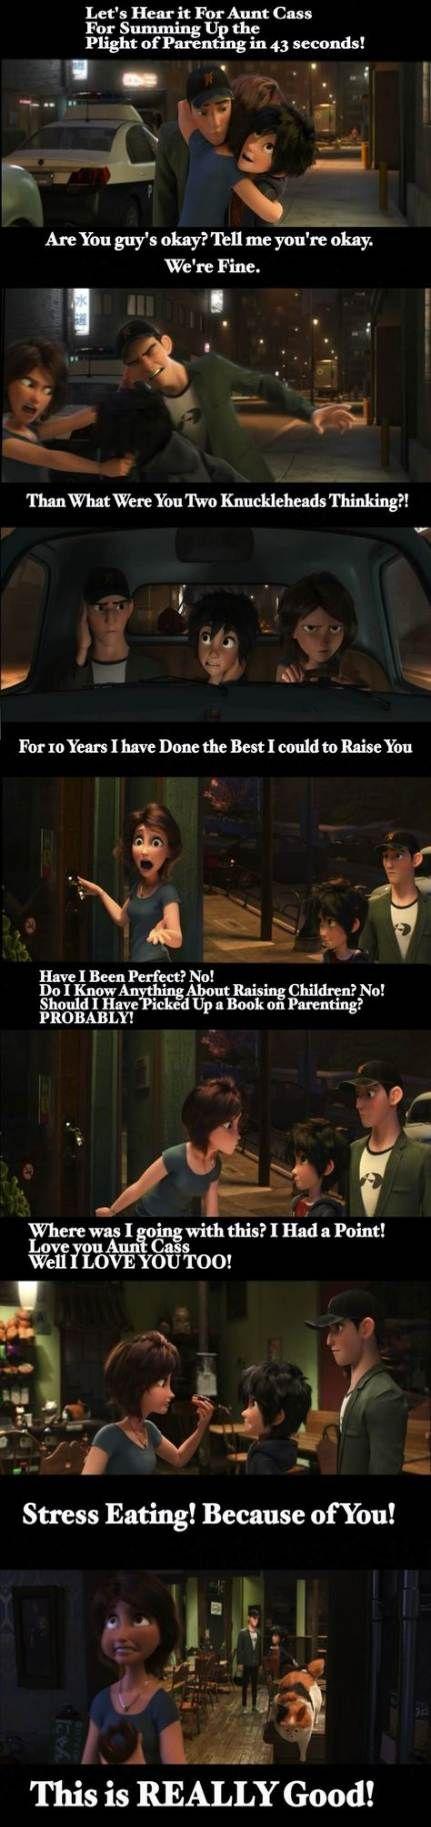 New Funny Disney Quotes Movie Ideas